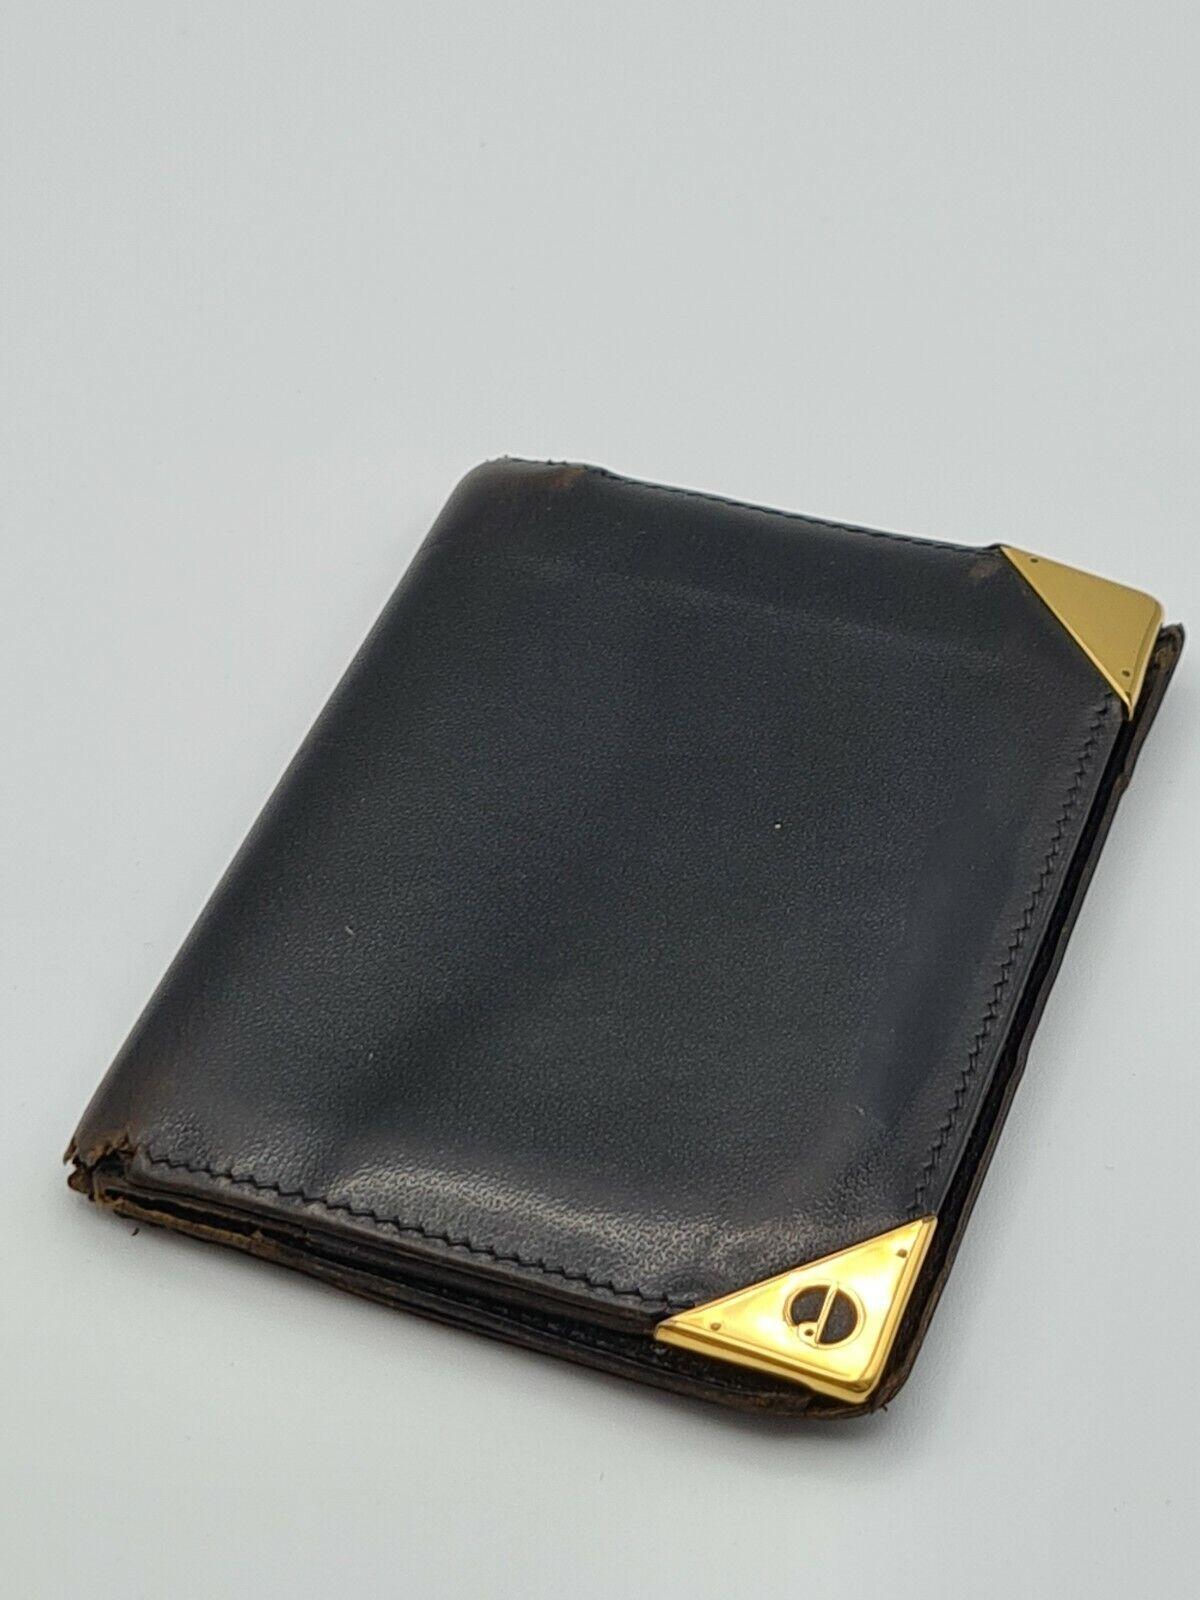 Dunhill Vintage Men's Black Leather Banknote Card Holder Thin Wallet